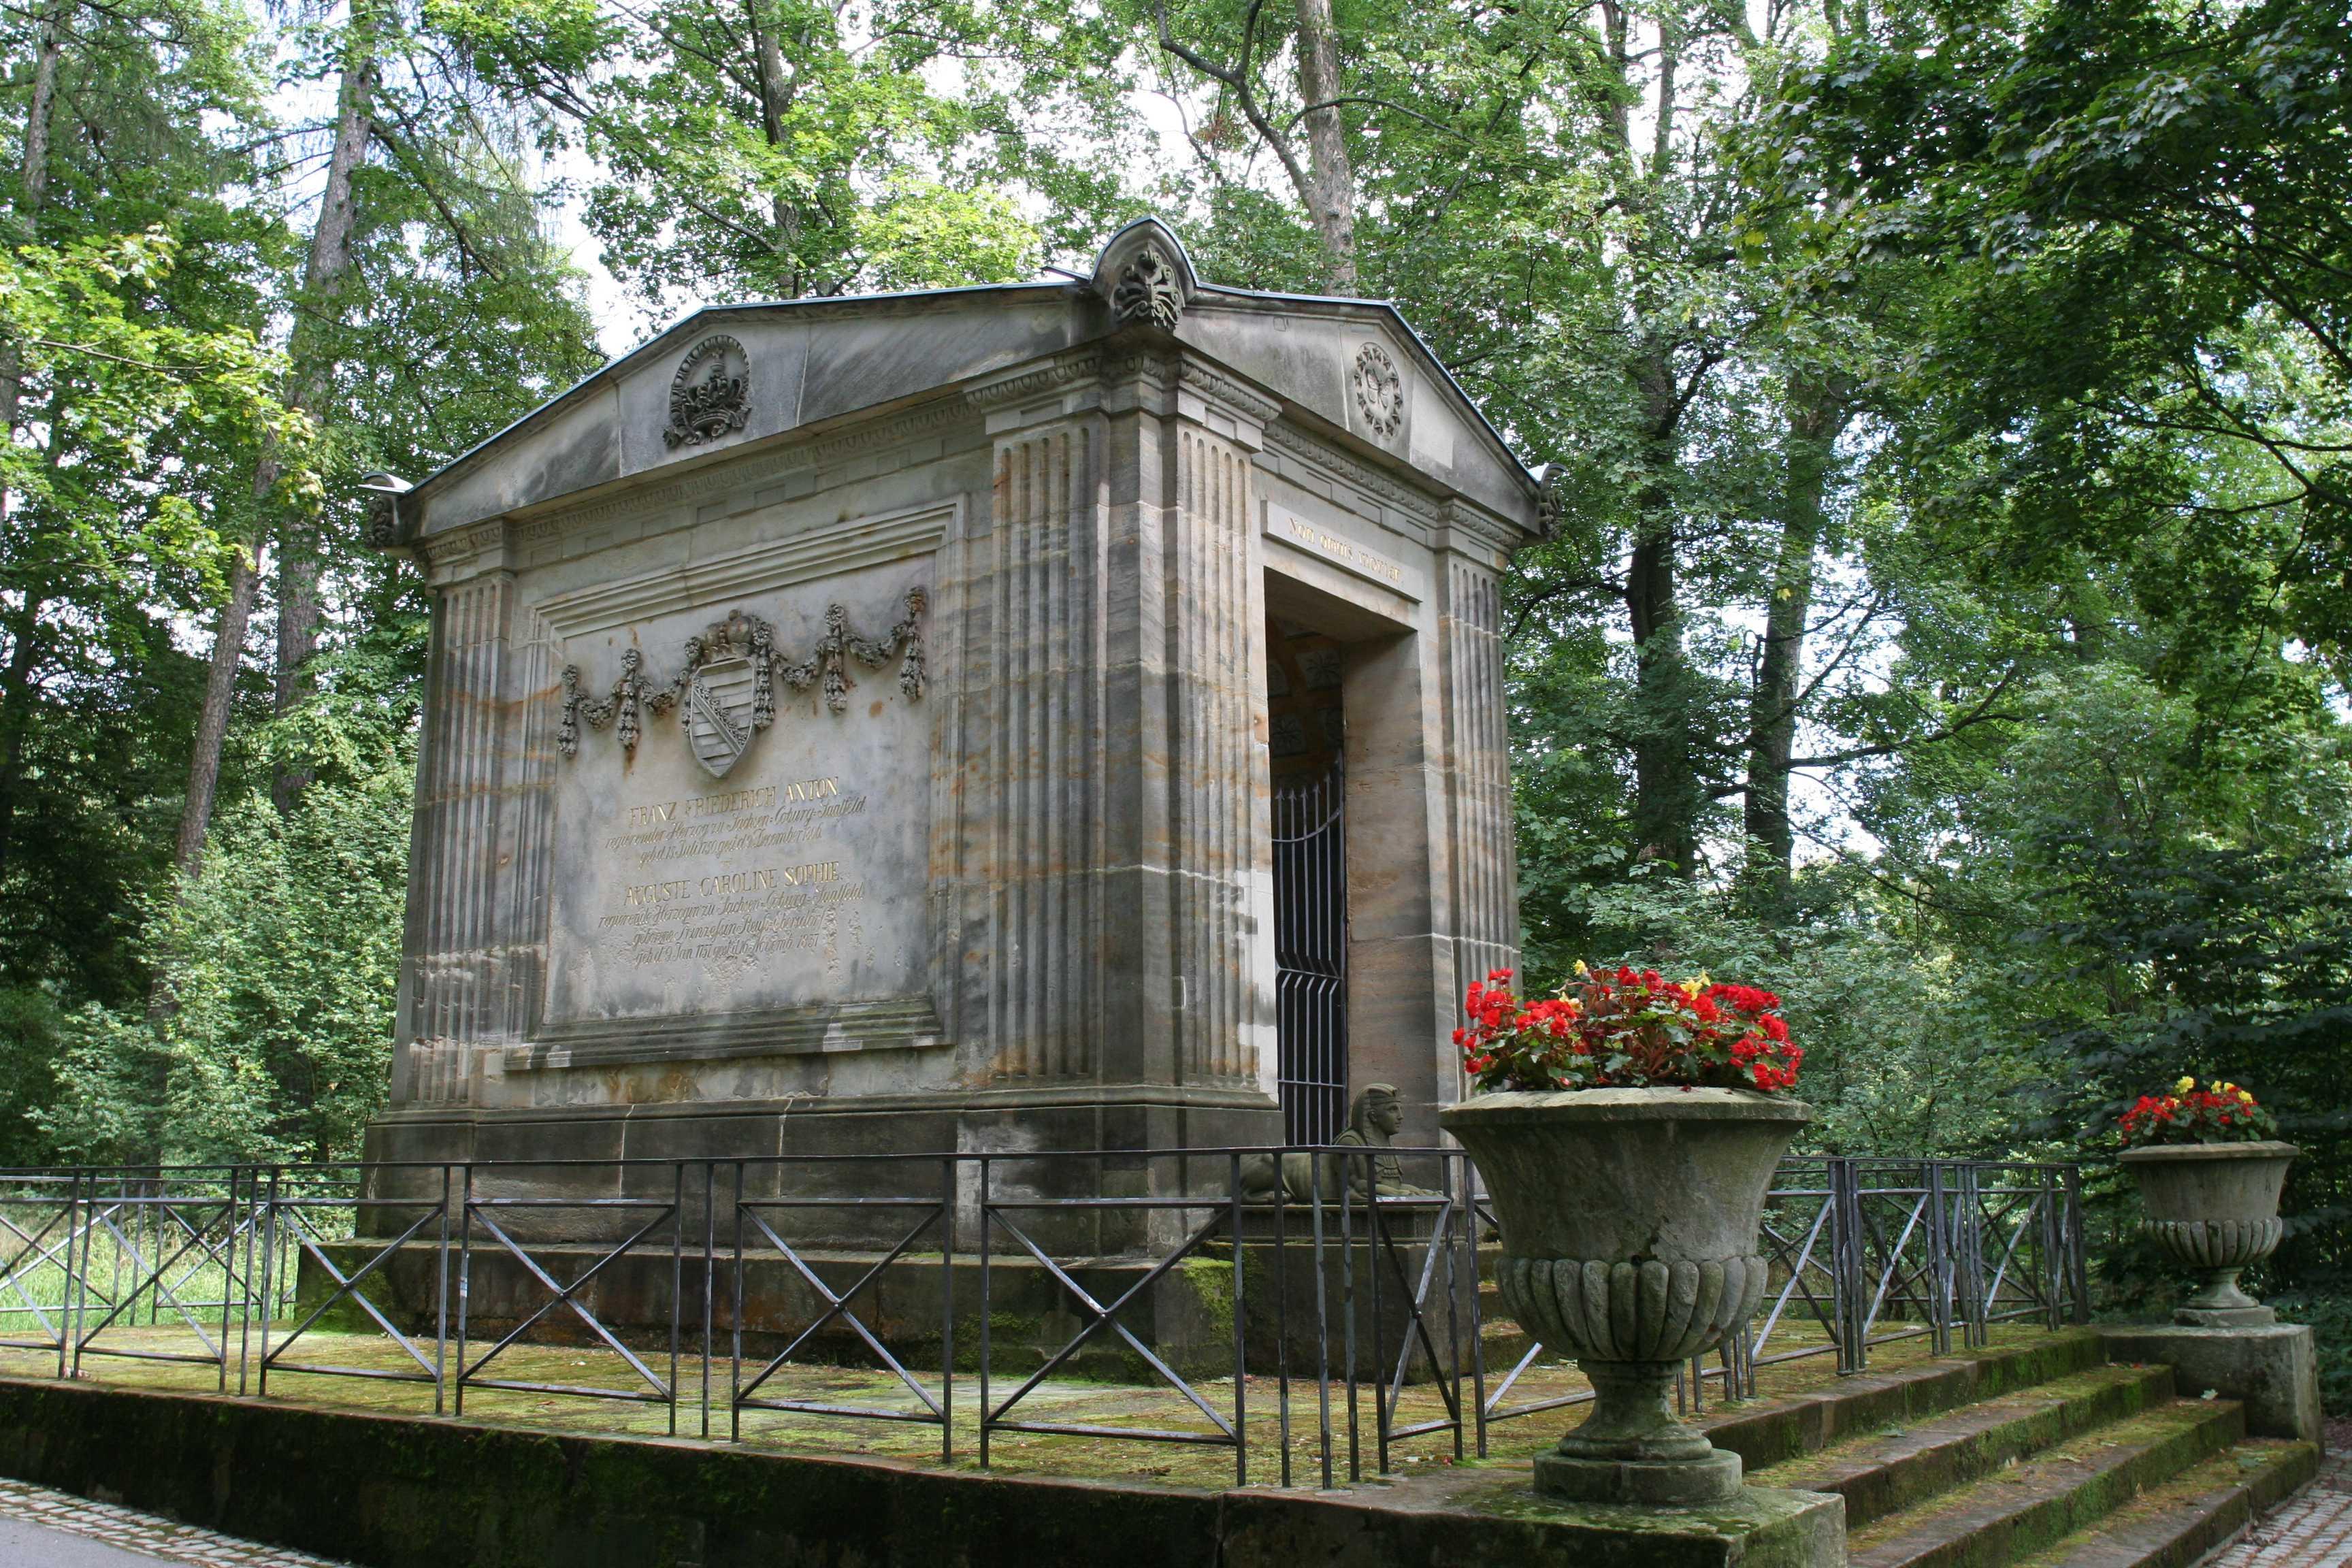 Small Garden Pictures File Coburg Hofgarten Mausoleum Jpg Wikimedia Commons